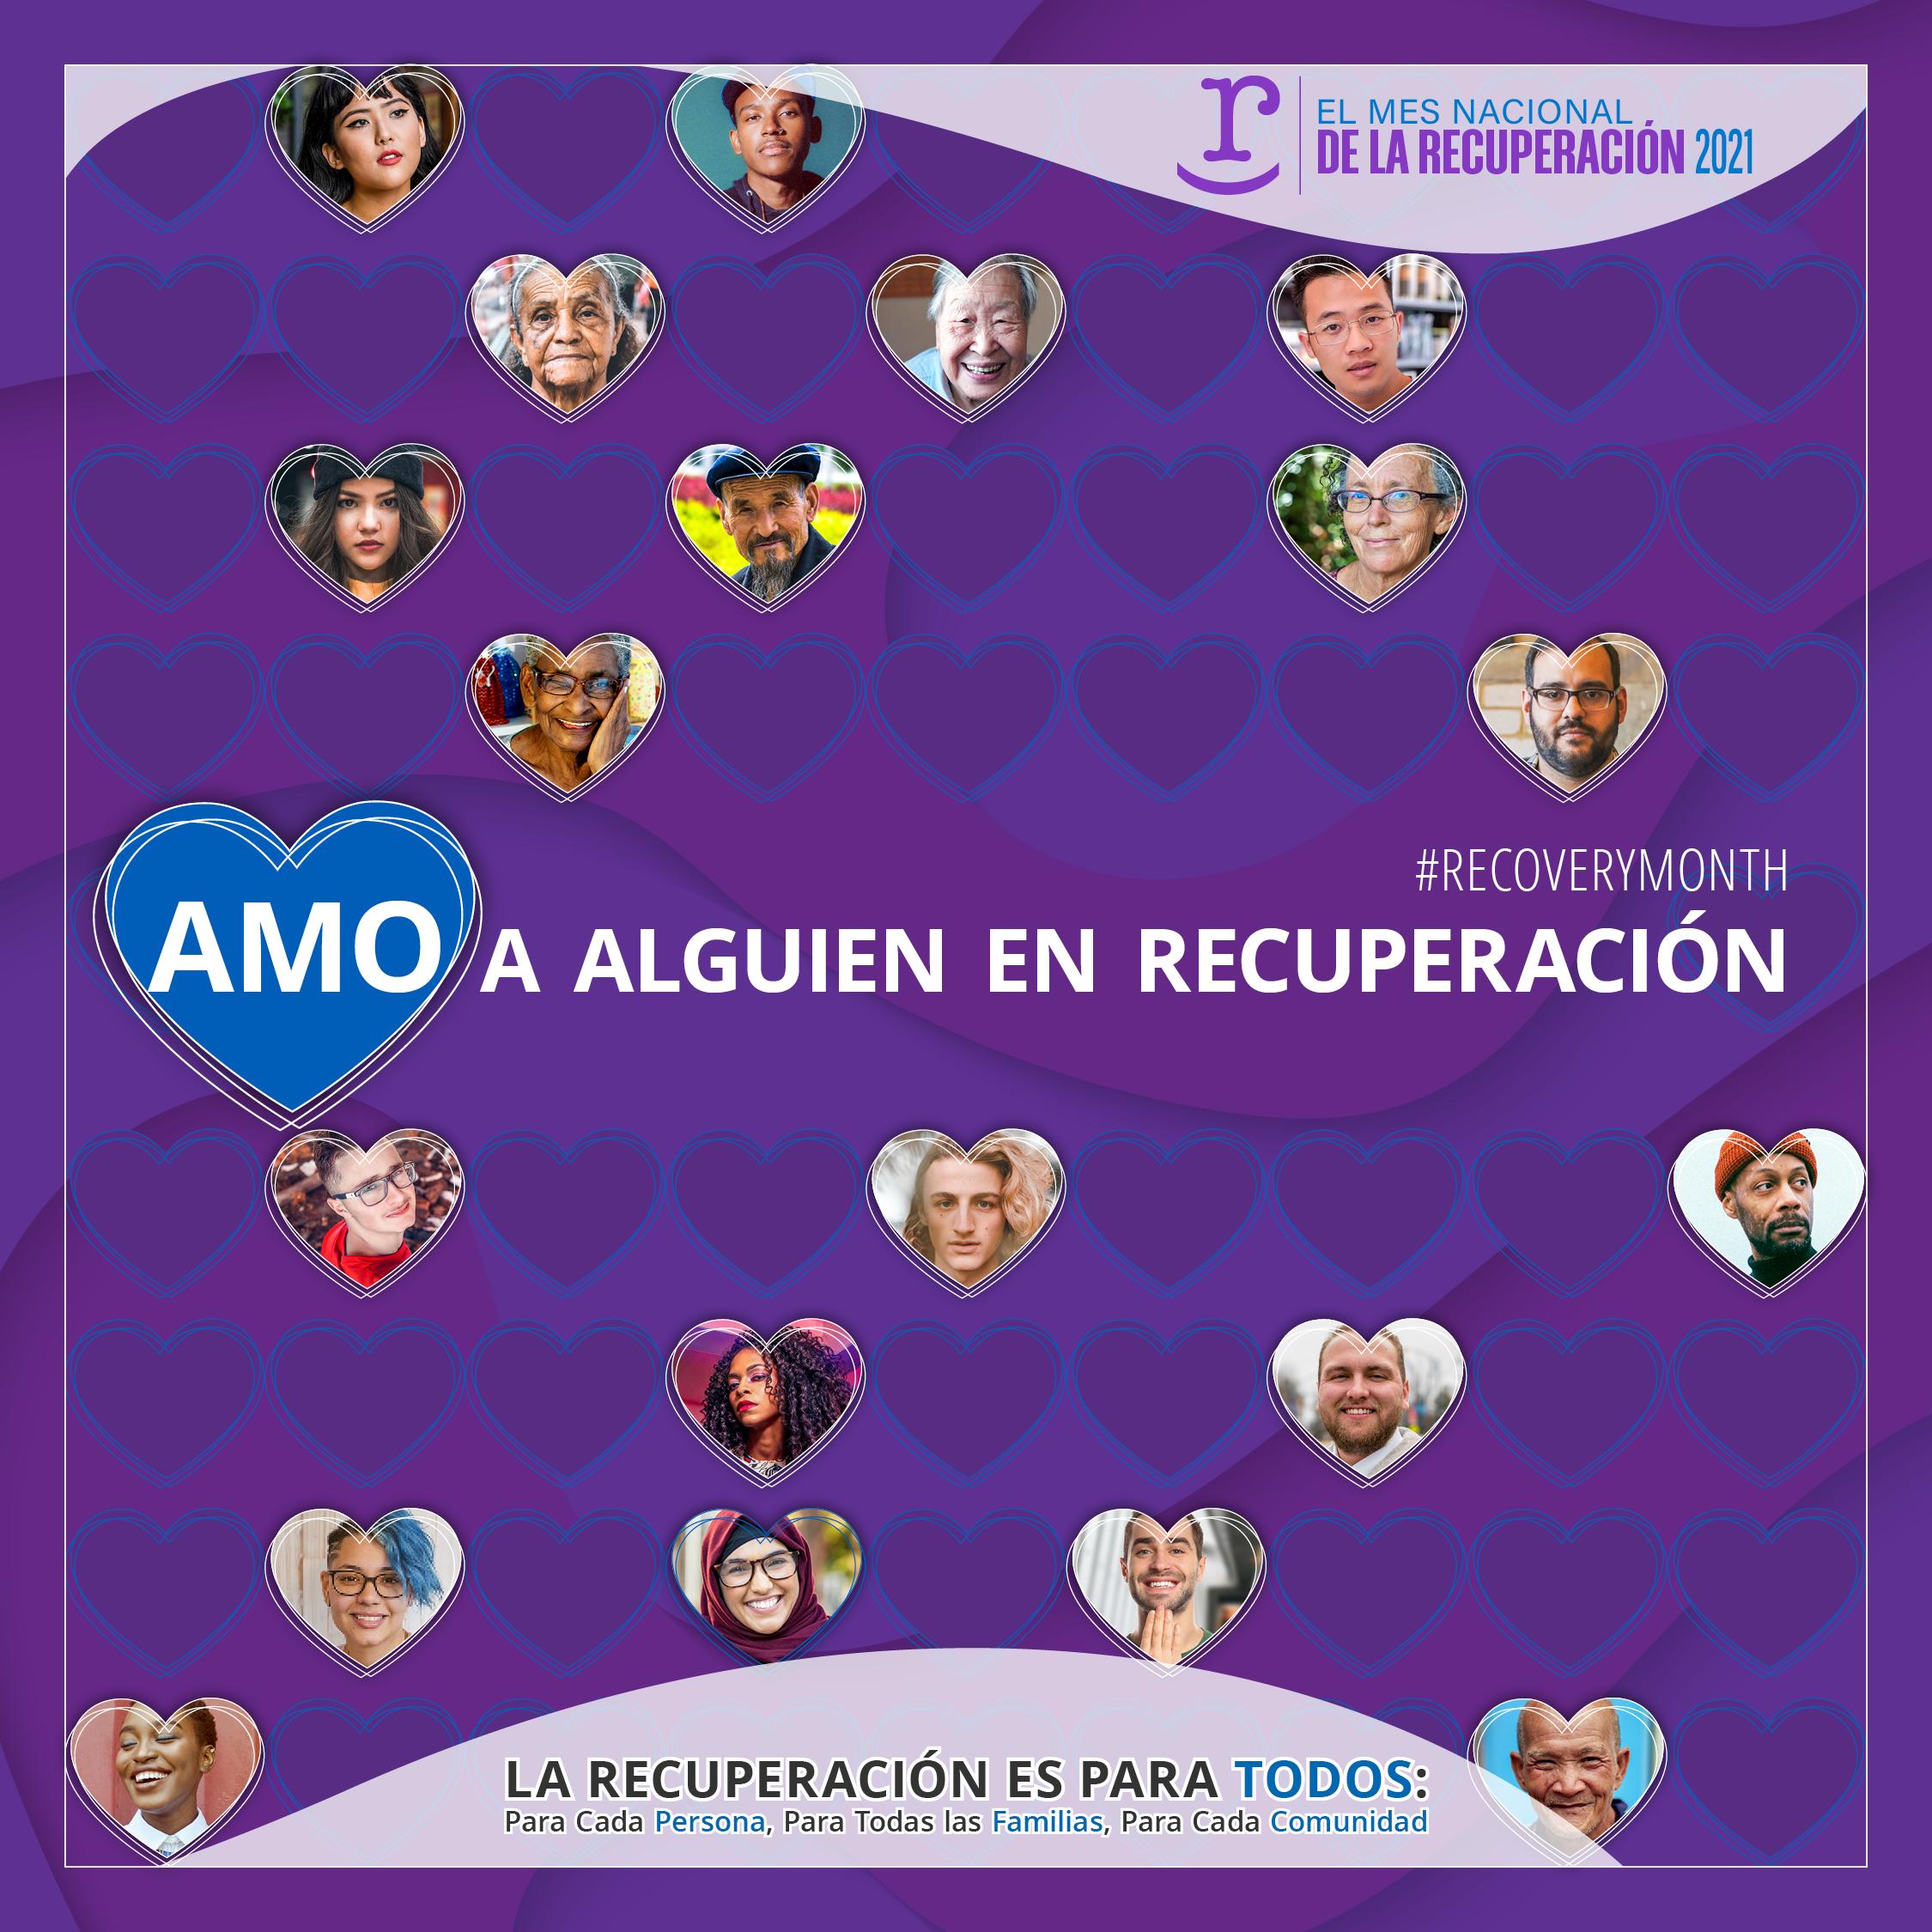 083021_love_recovery-month_social-media_SPN_ig_v1